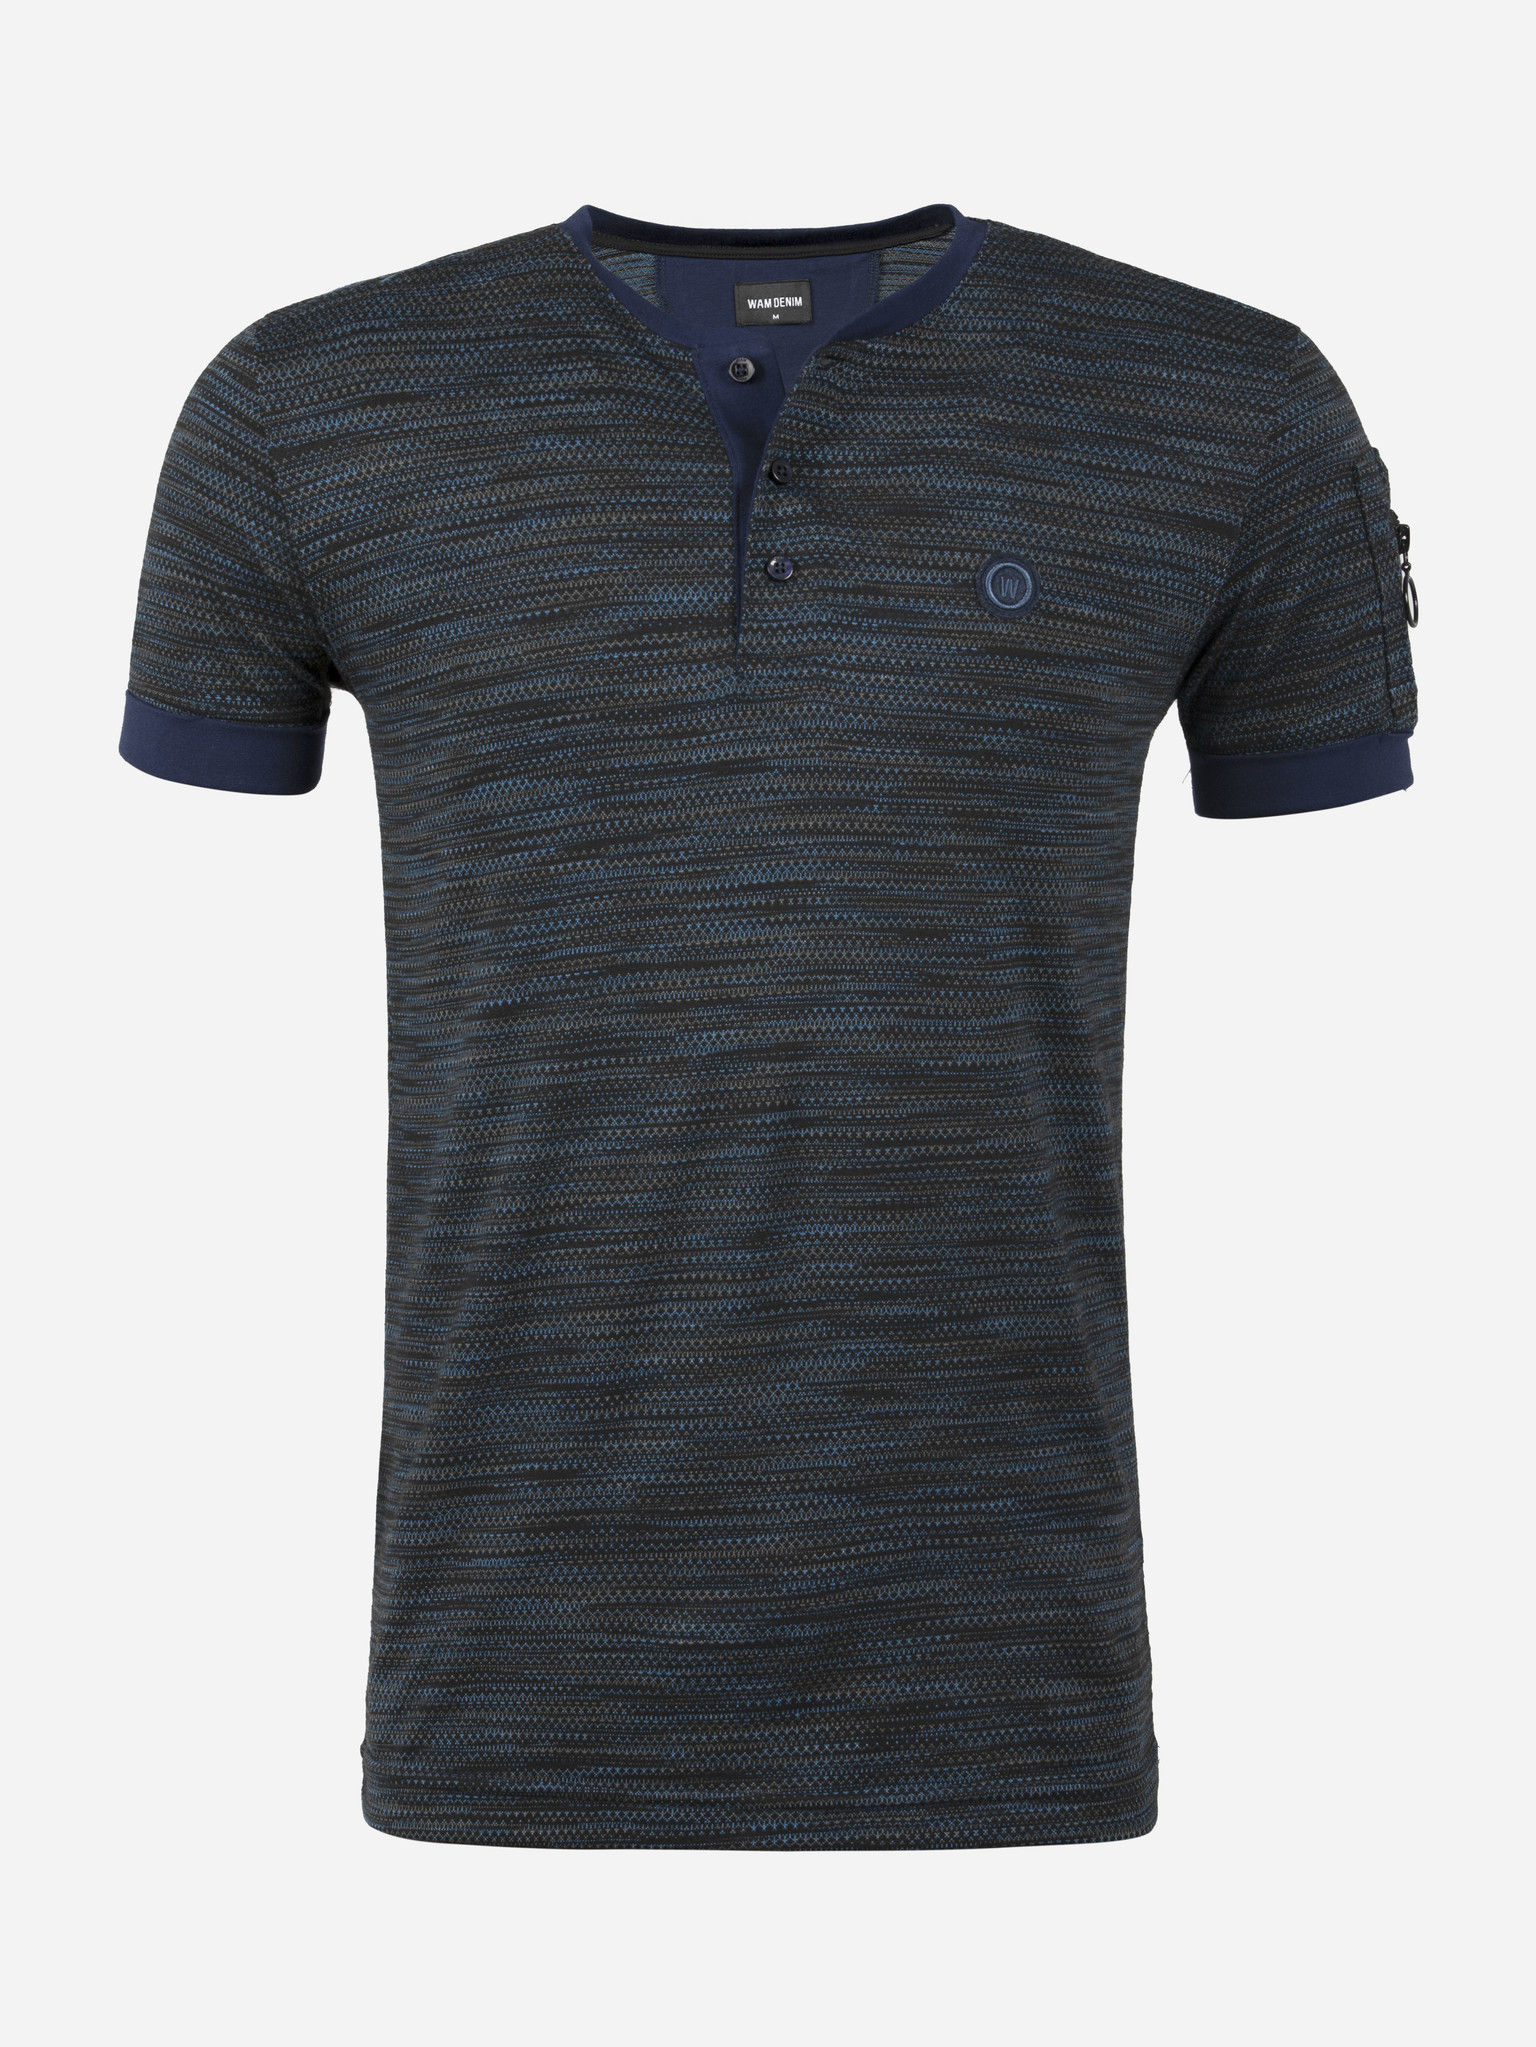 Wam Denim T-Shirt  Maat: 2XL